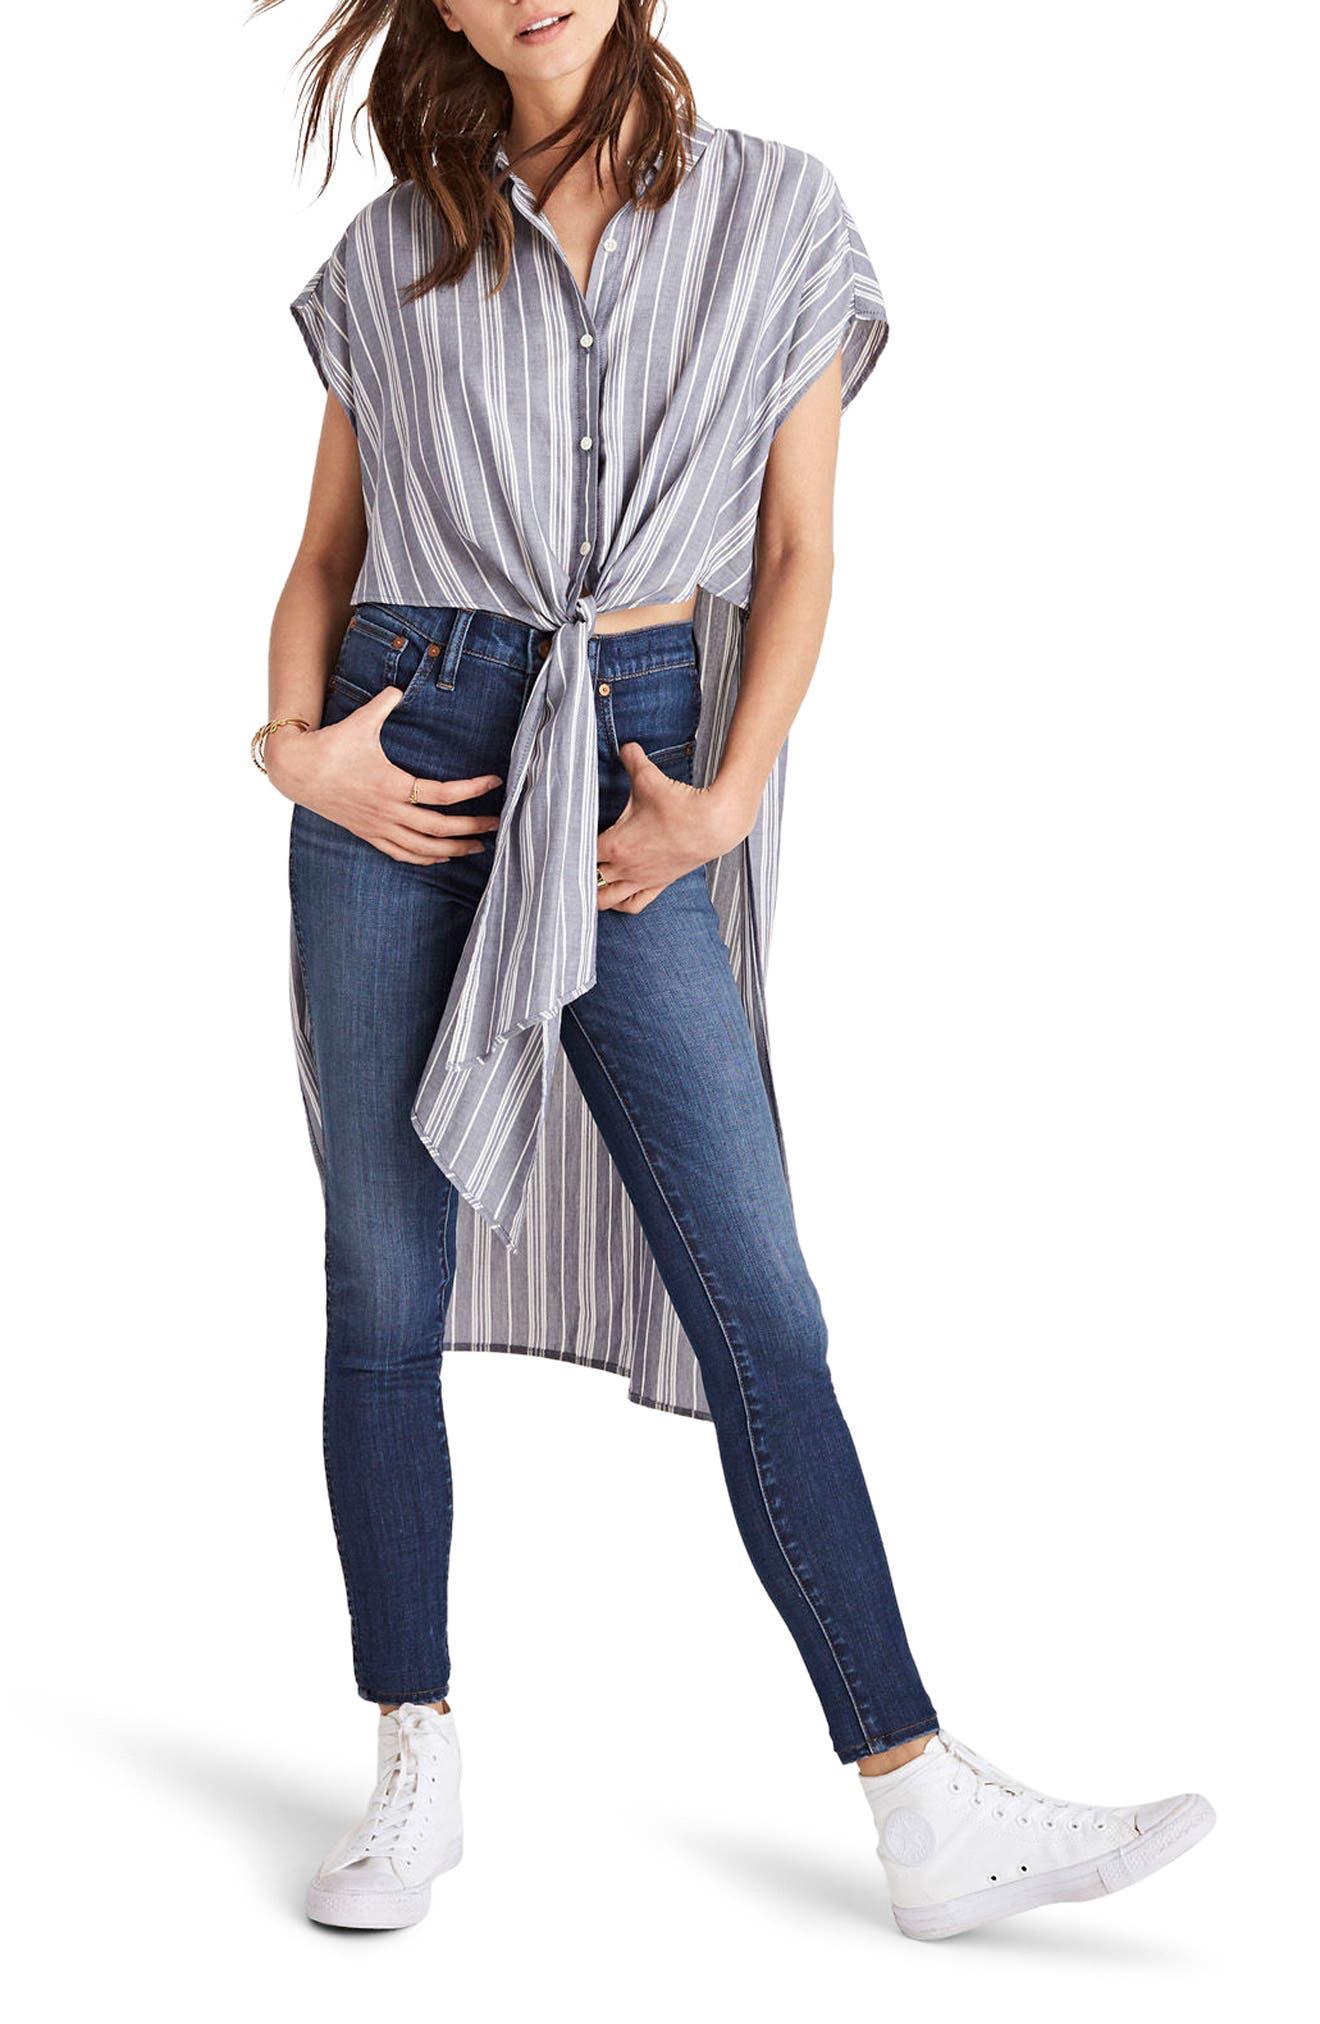 Main Image - Madewell Side Slit Tunic Shirt